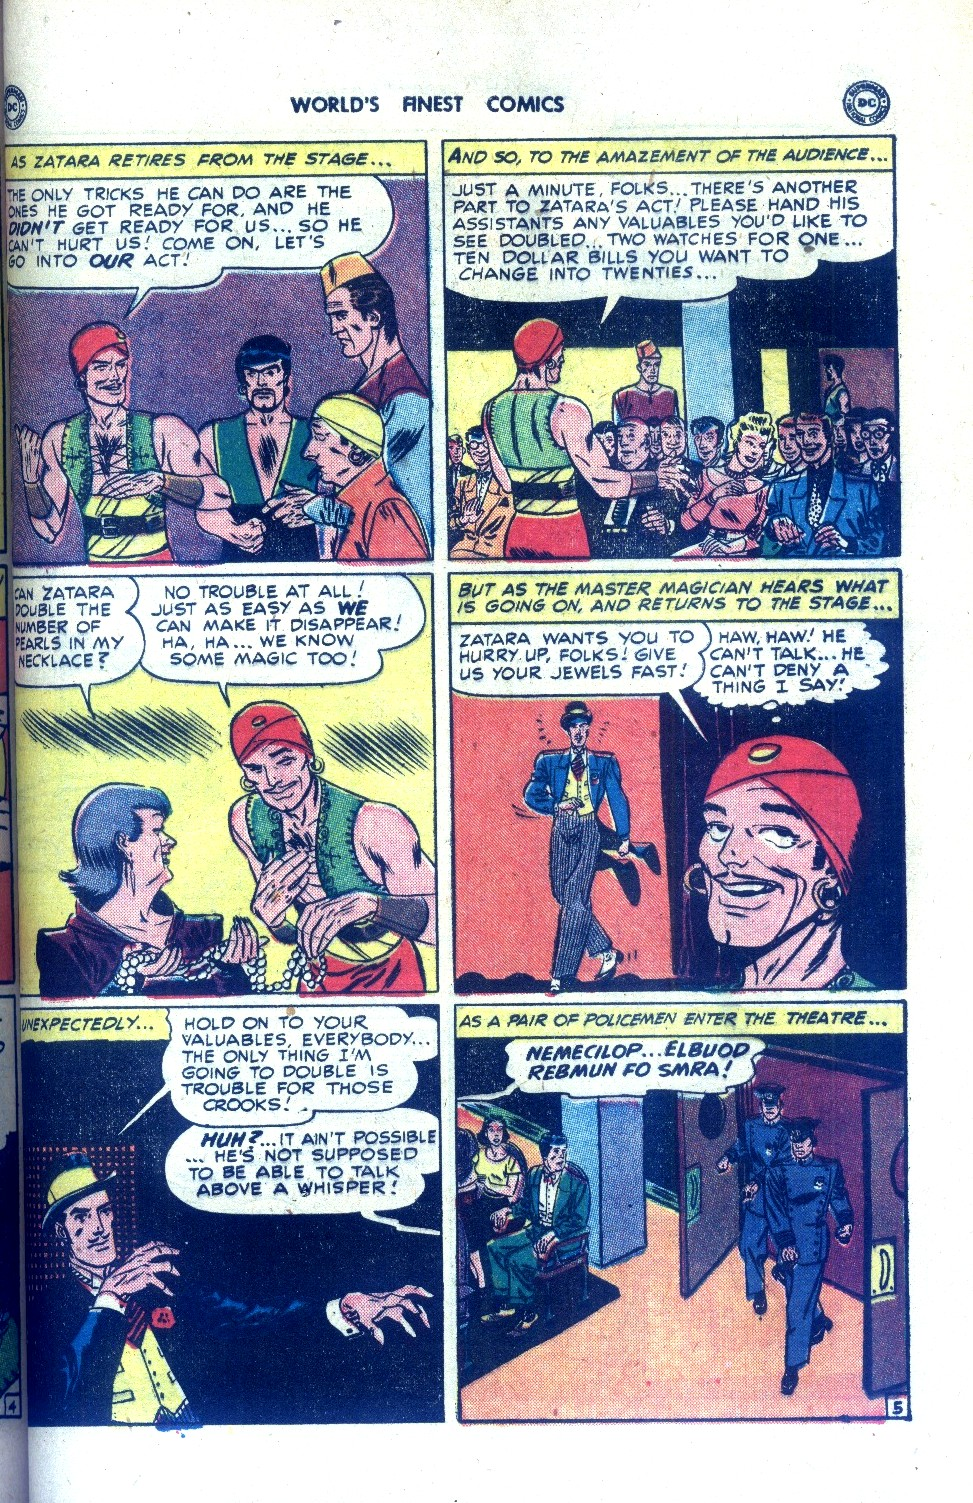 Read online World's Finest Comics comic -  Issue #43 - 55